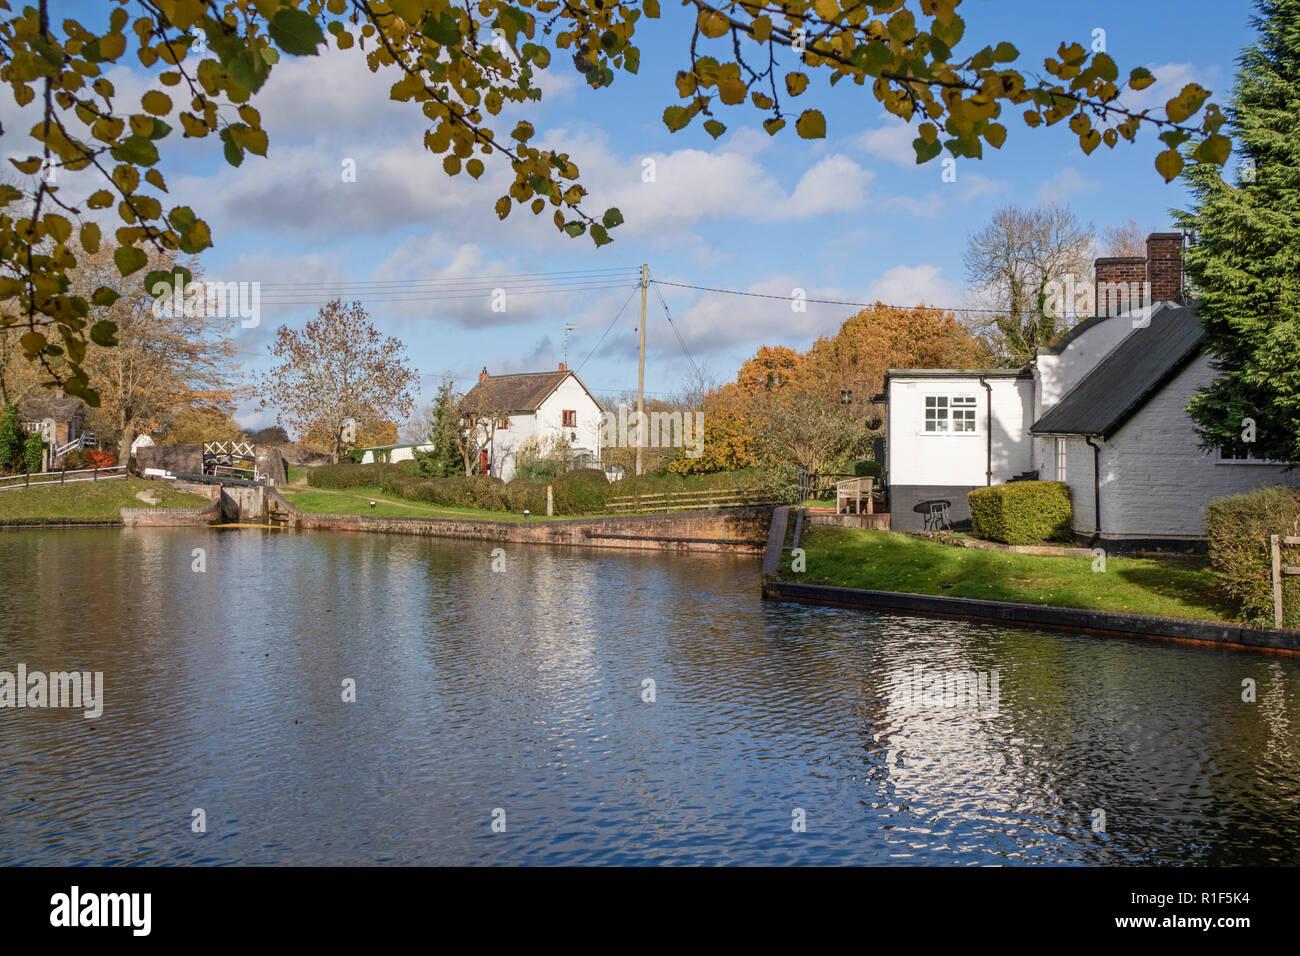 Stratford upon Avon Canal in autumn light at Kingswood Junction, Lapworth, Warwickshire, England, UK - Stock Image